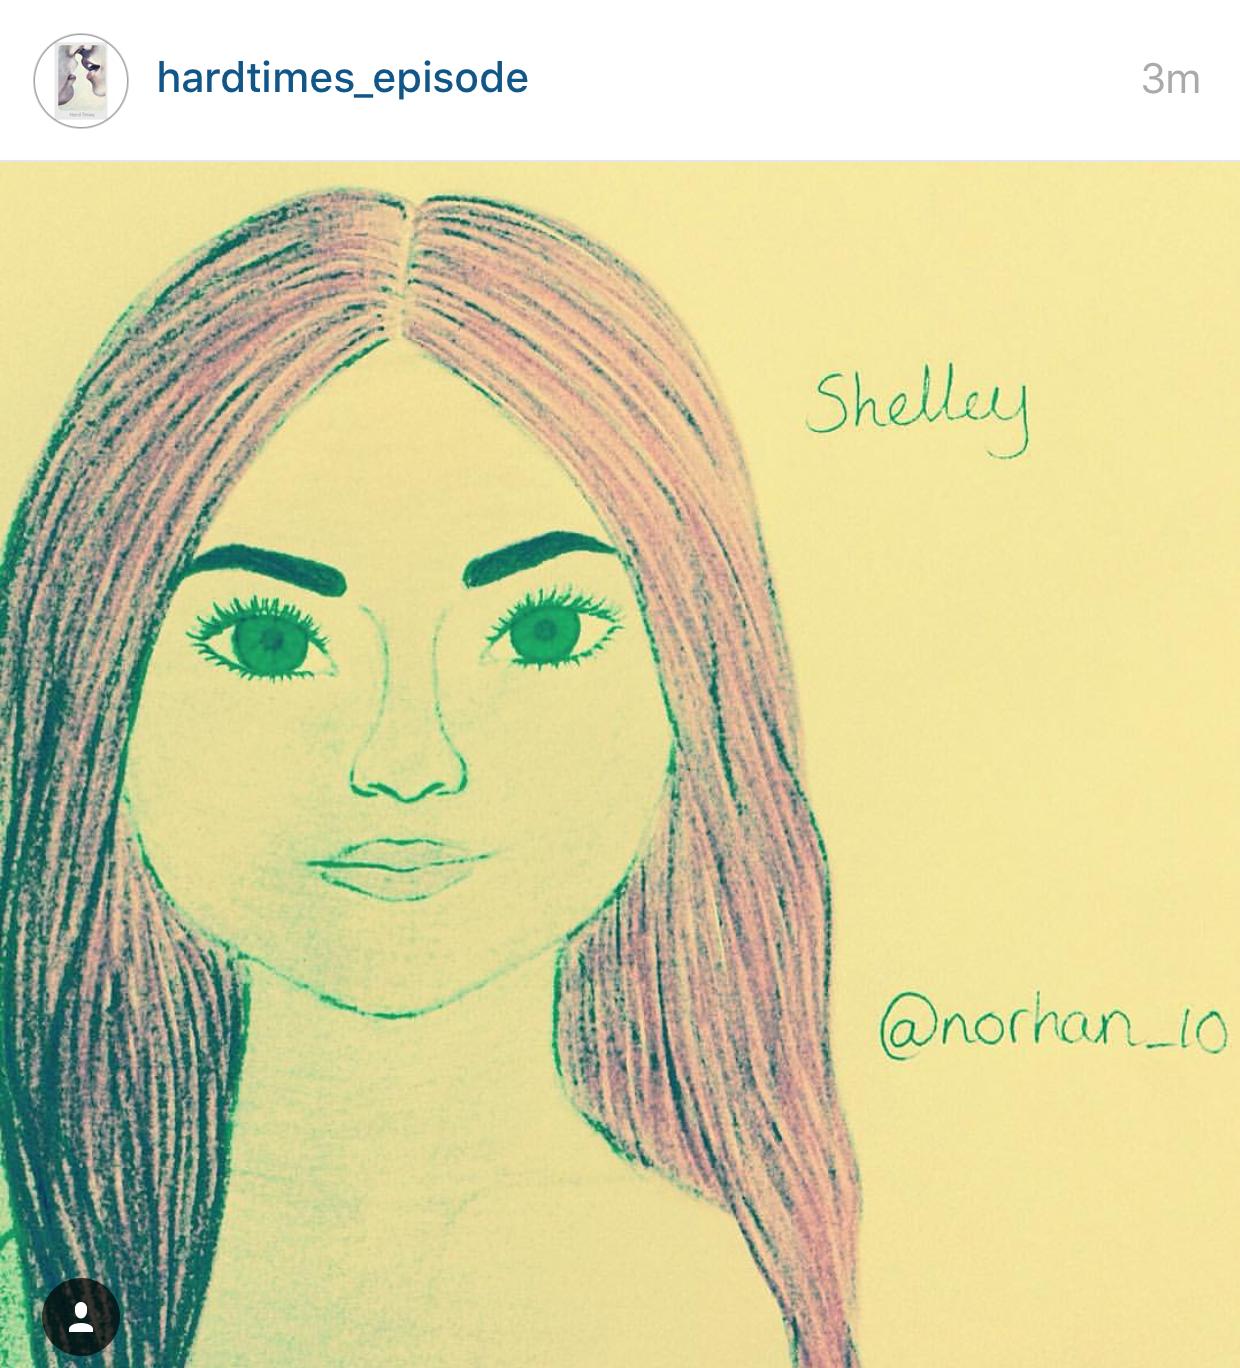 """Shelley"" by @hardtimes_episode"